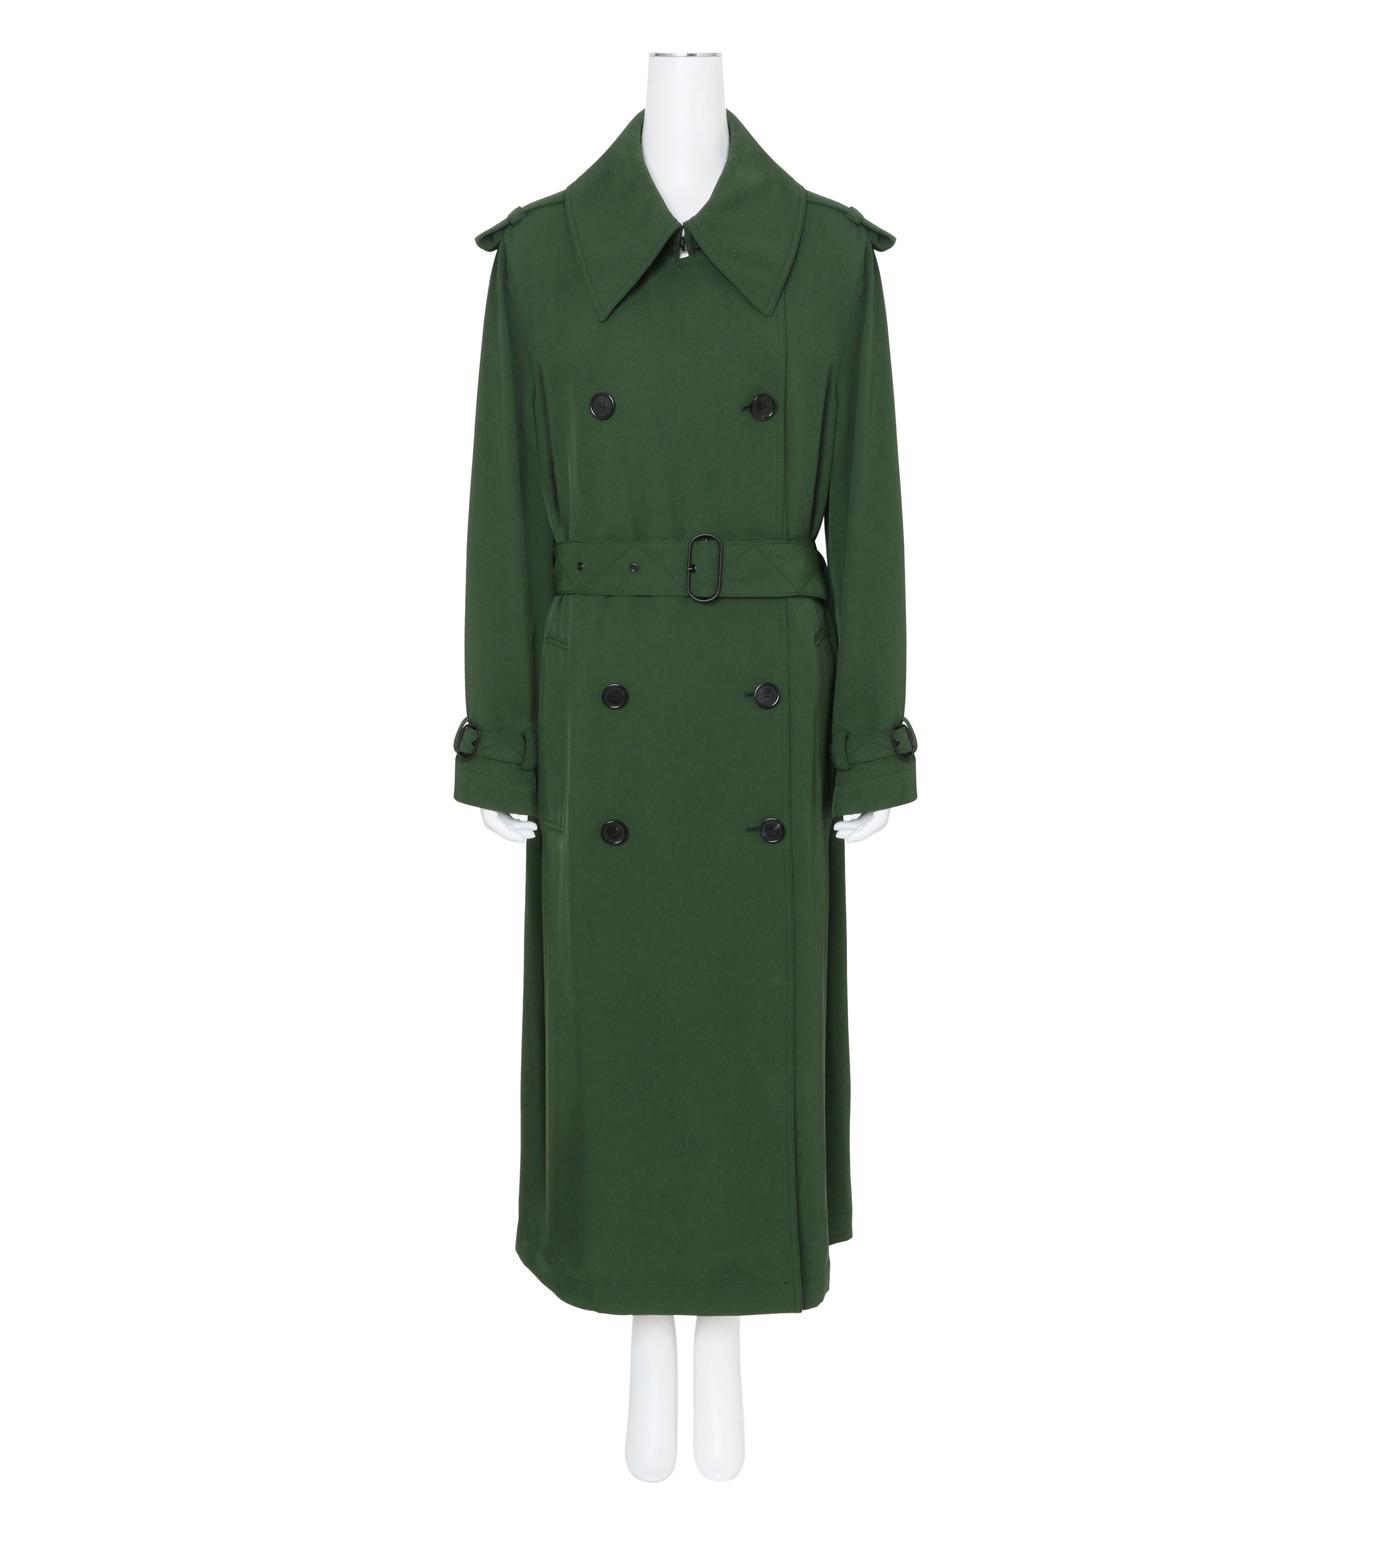 ACNE STUDIOS(アクネ ストゥディオズ)のTrench Coat-GREEN(コート/coat)-12N166-22 拡大詳細画像1